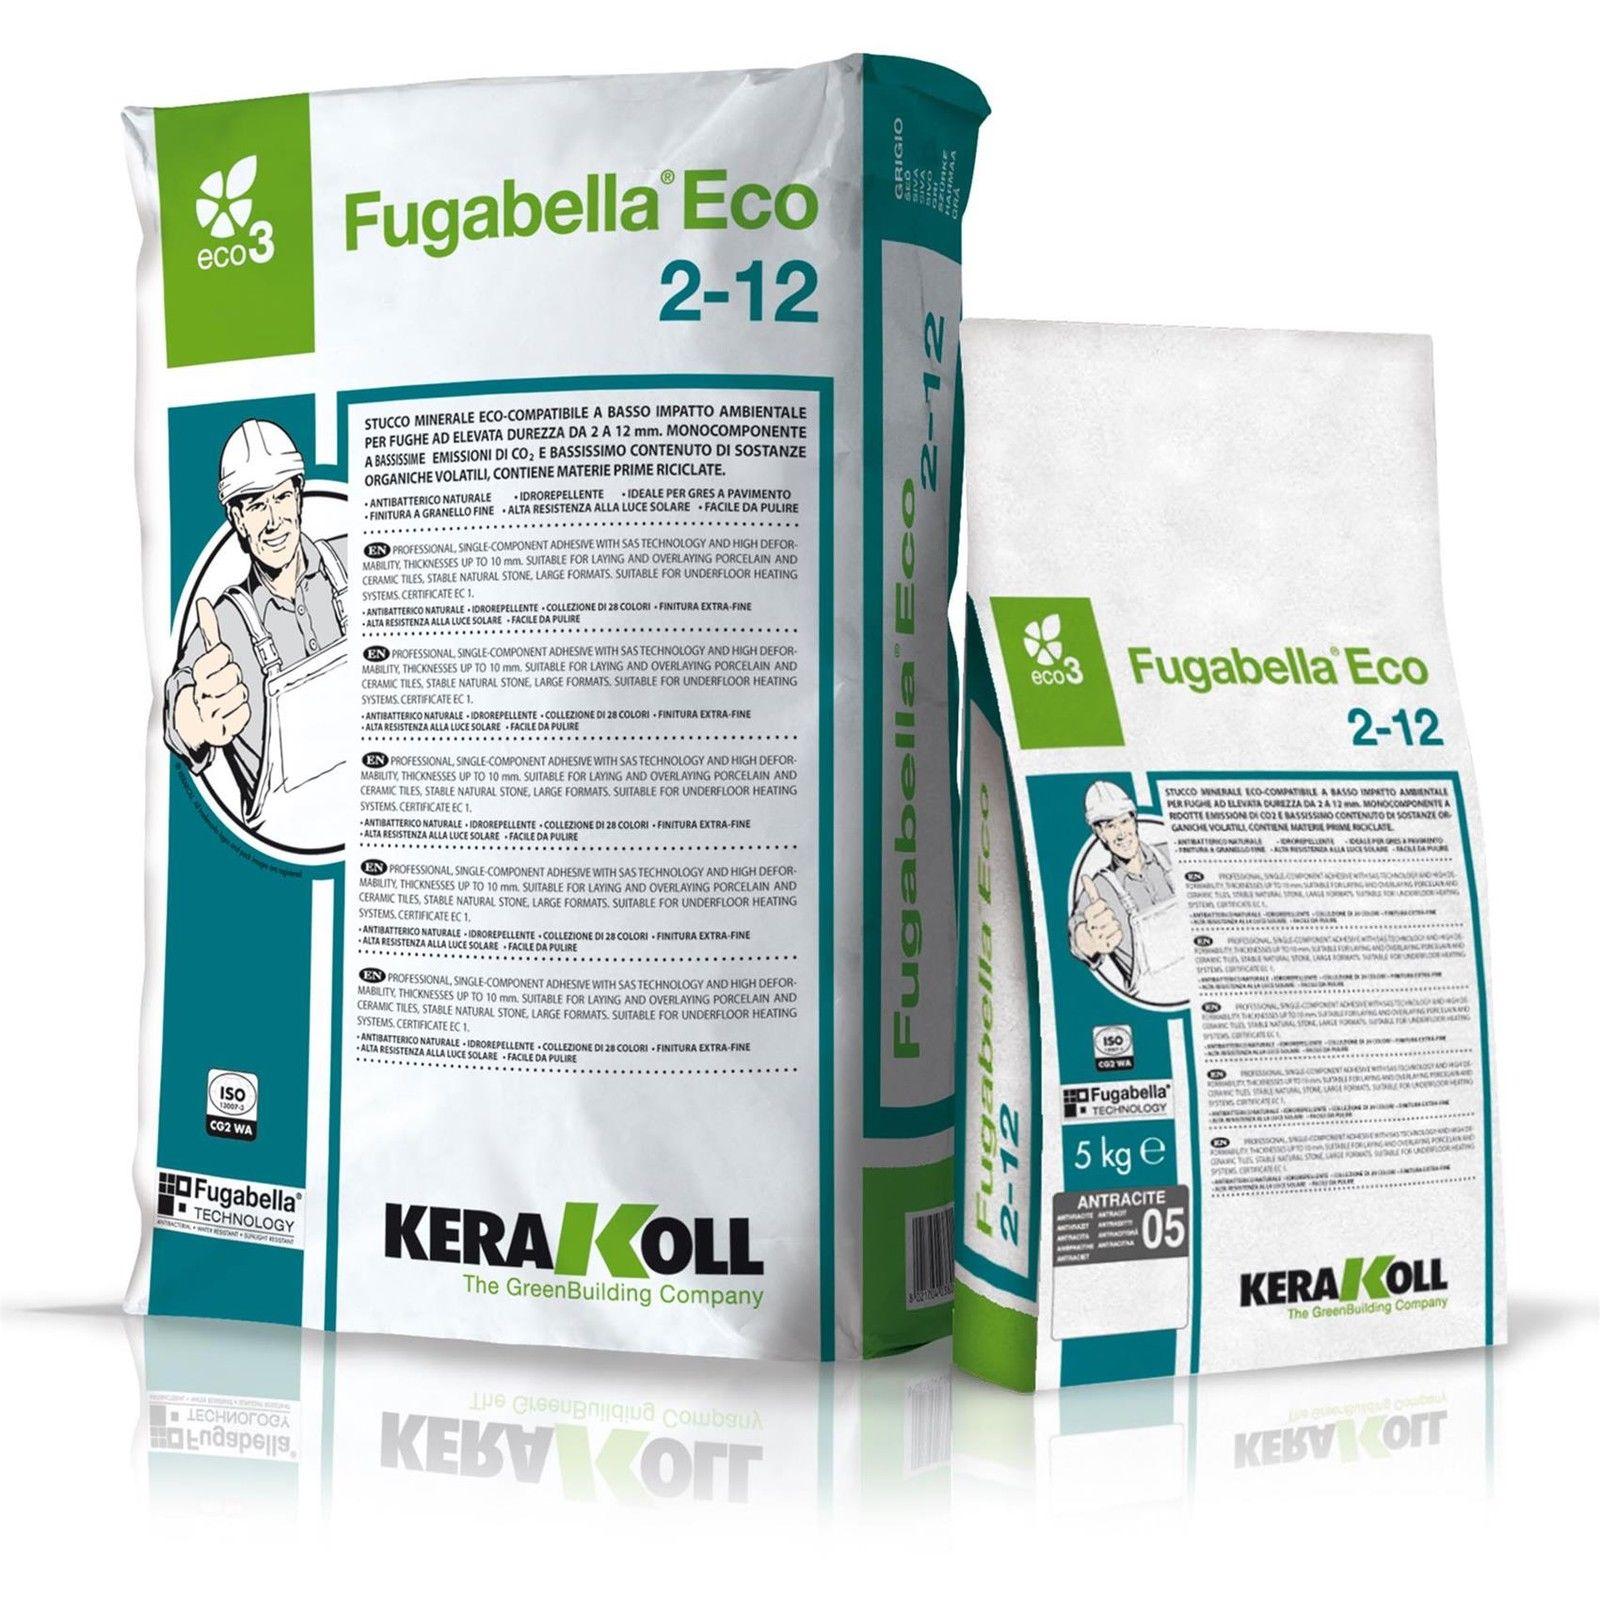 Kerakoll fugabella eco 2-12 stucco fuga per piastrelle grigio ferro kg5